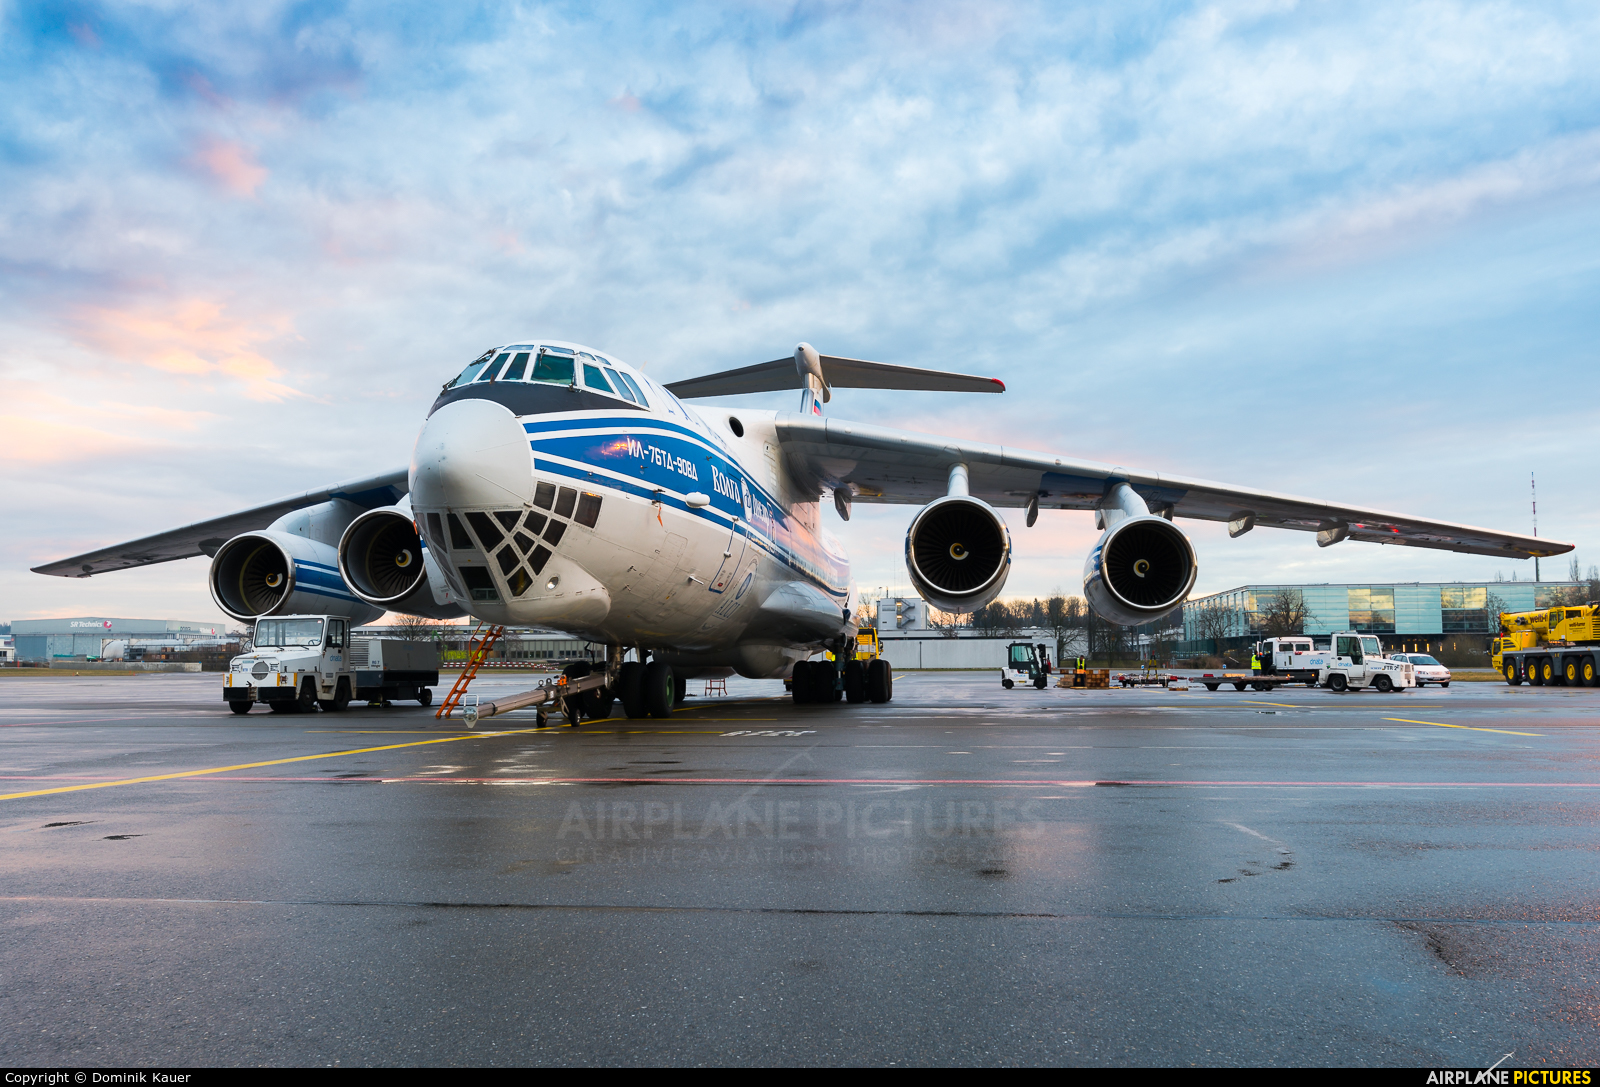 Volga Dnepr Airlines RA-76503 aircraft at Zurich